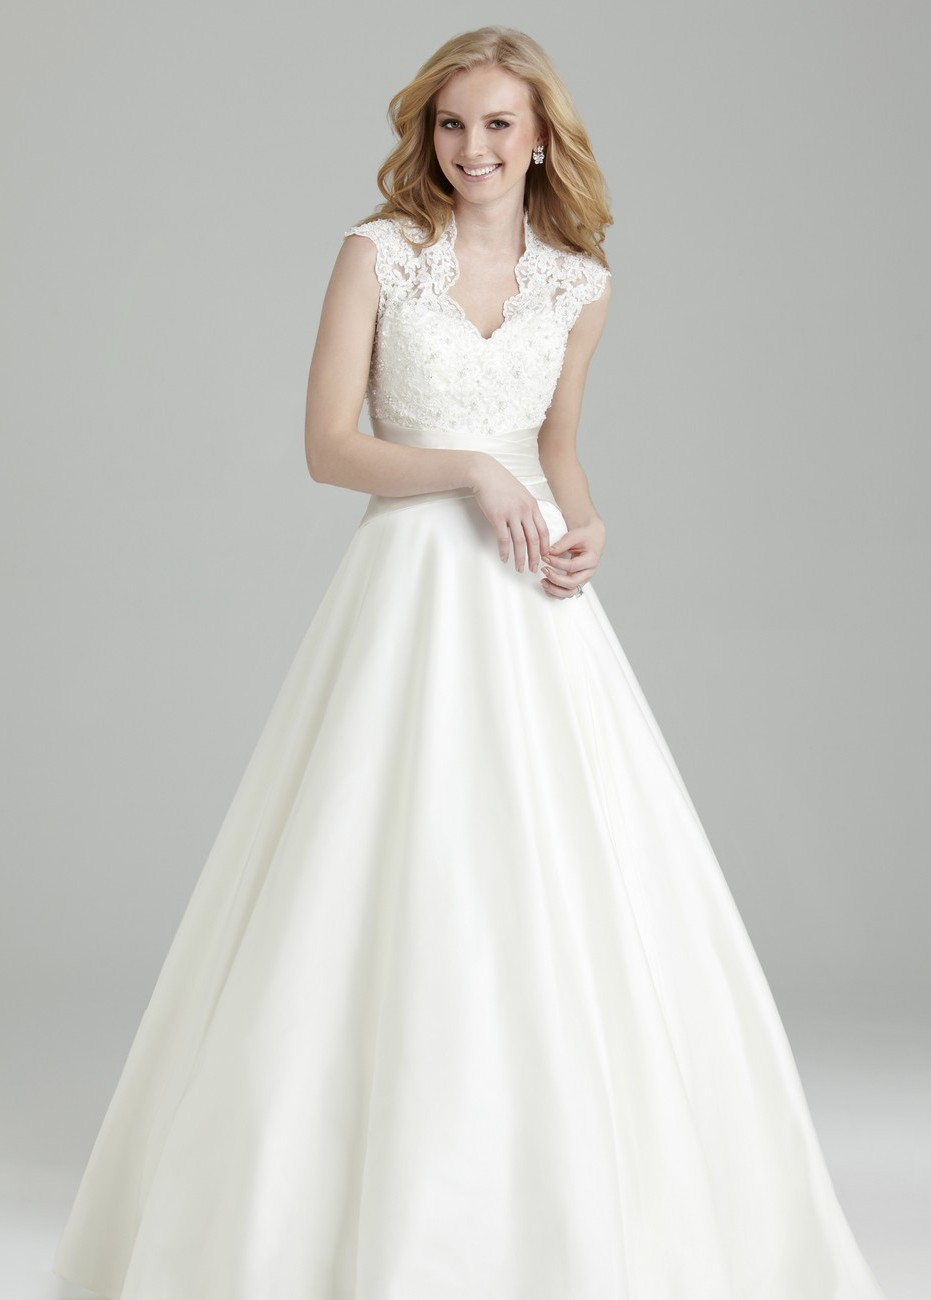 wedding dress sewing patterns wedding dress sewing patterns bf